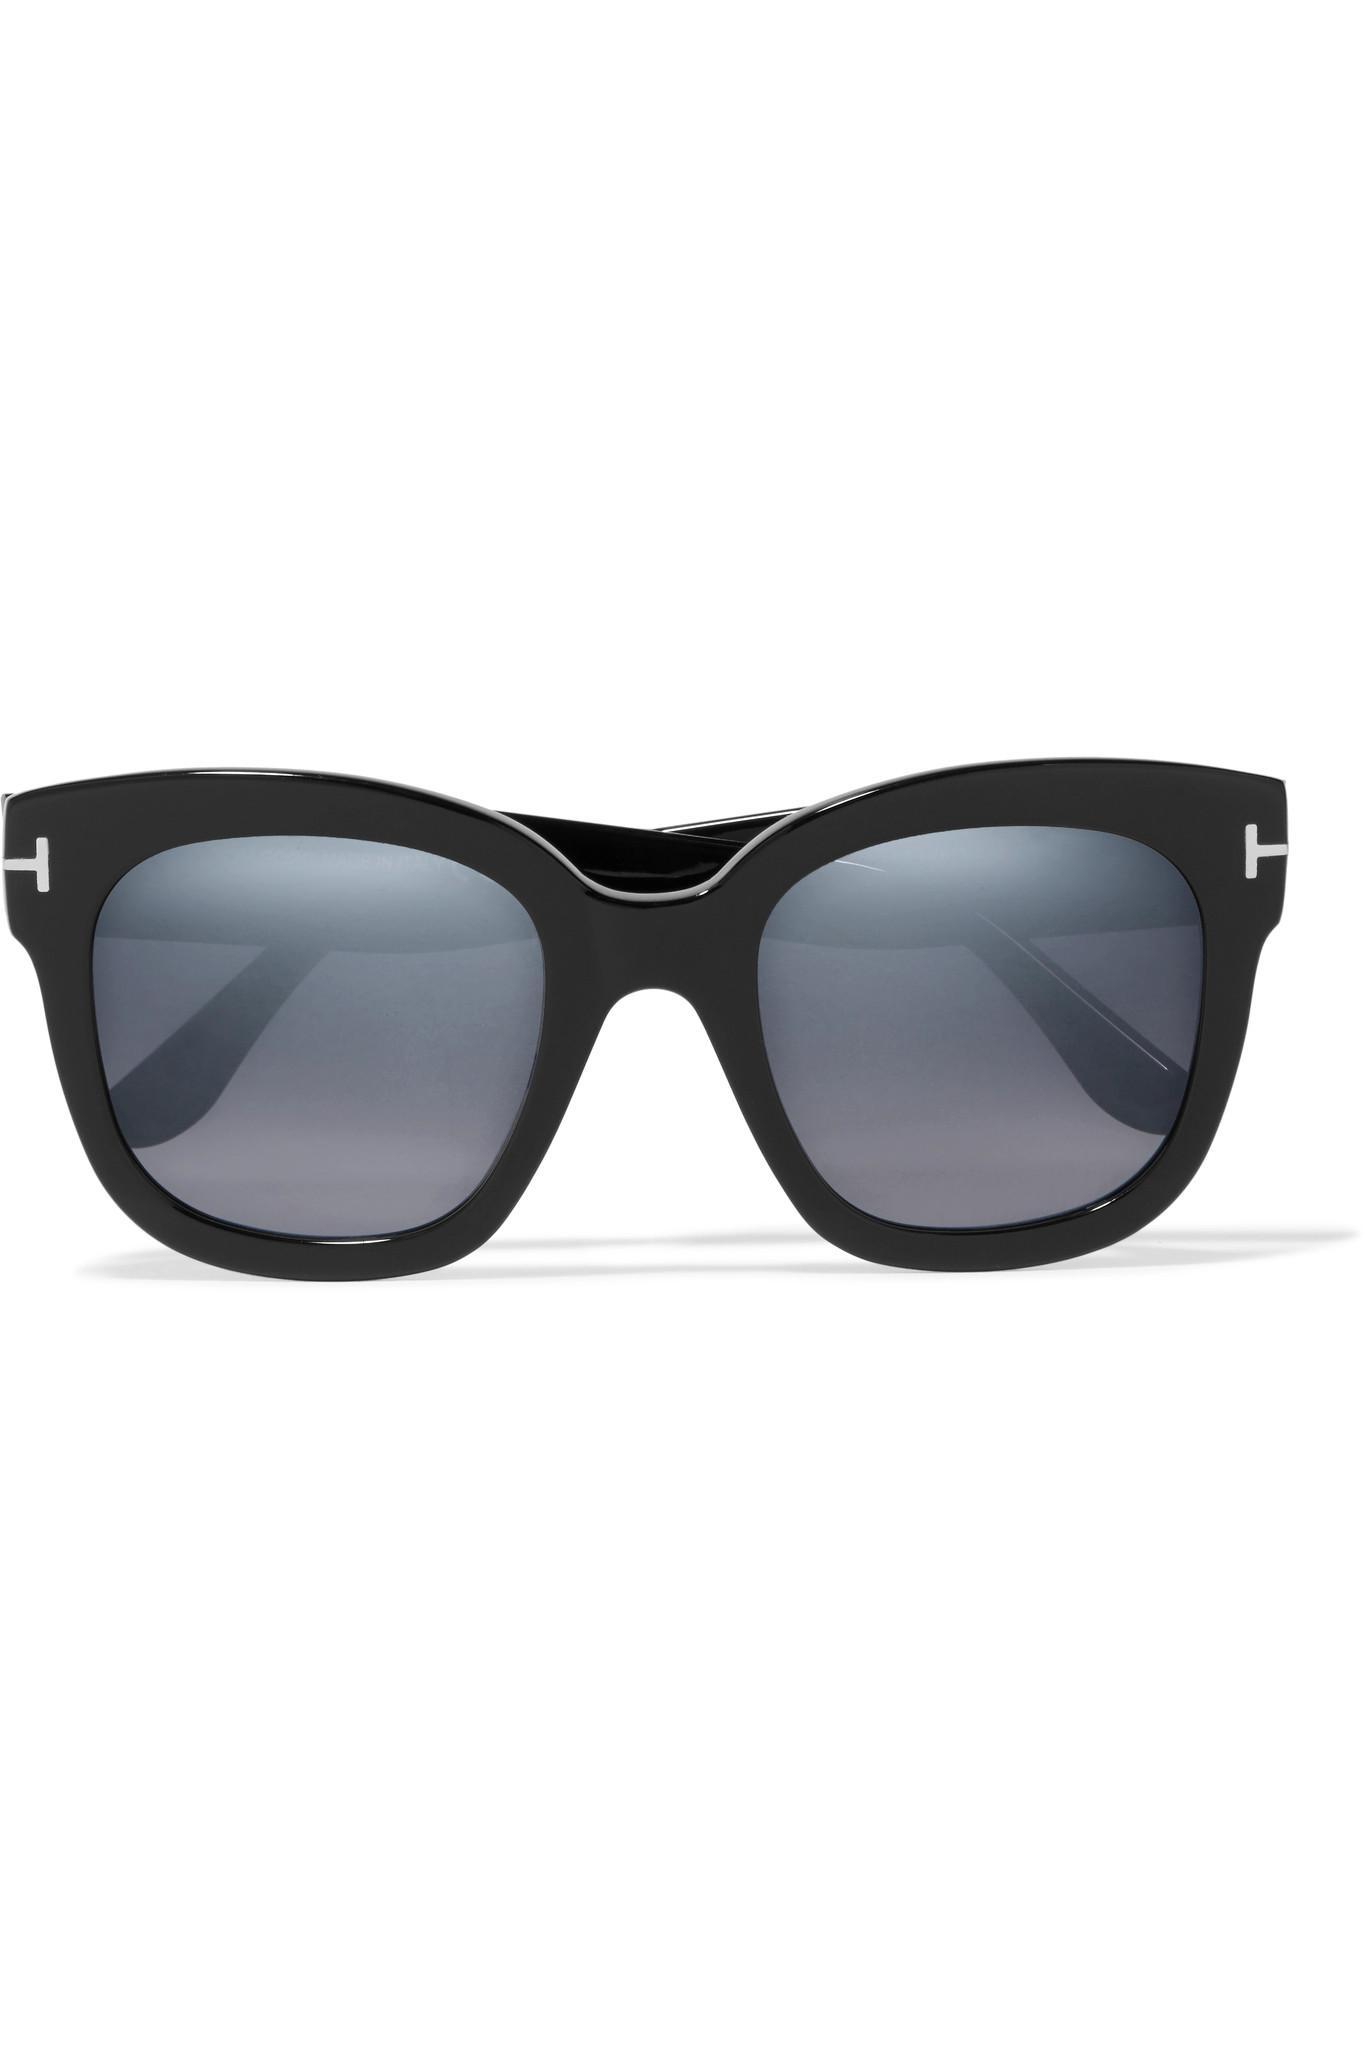 2420d38419083 Lyst - Tom Ford Cat-eye Acetate Sunglasses in Black